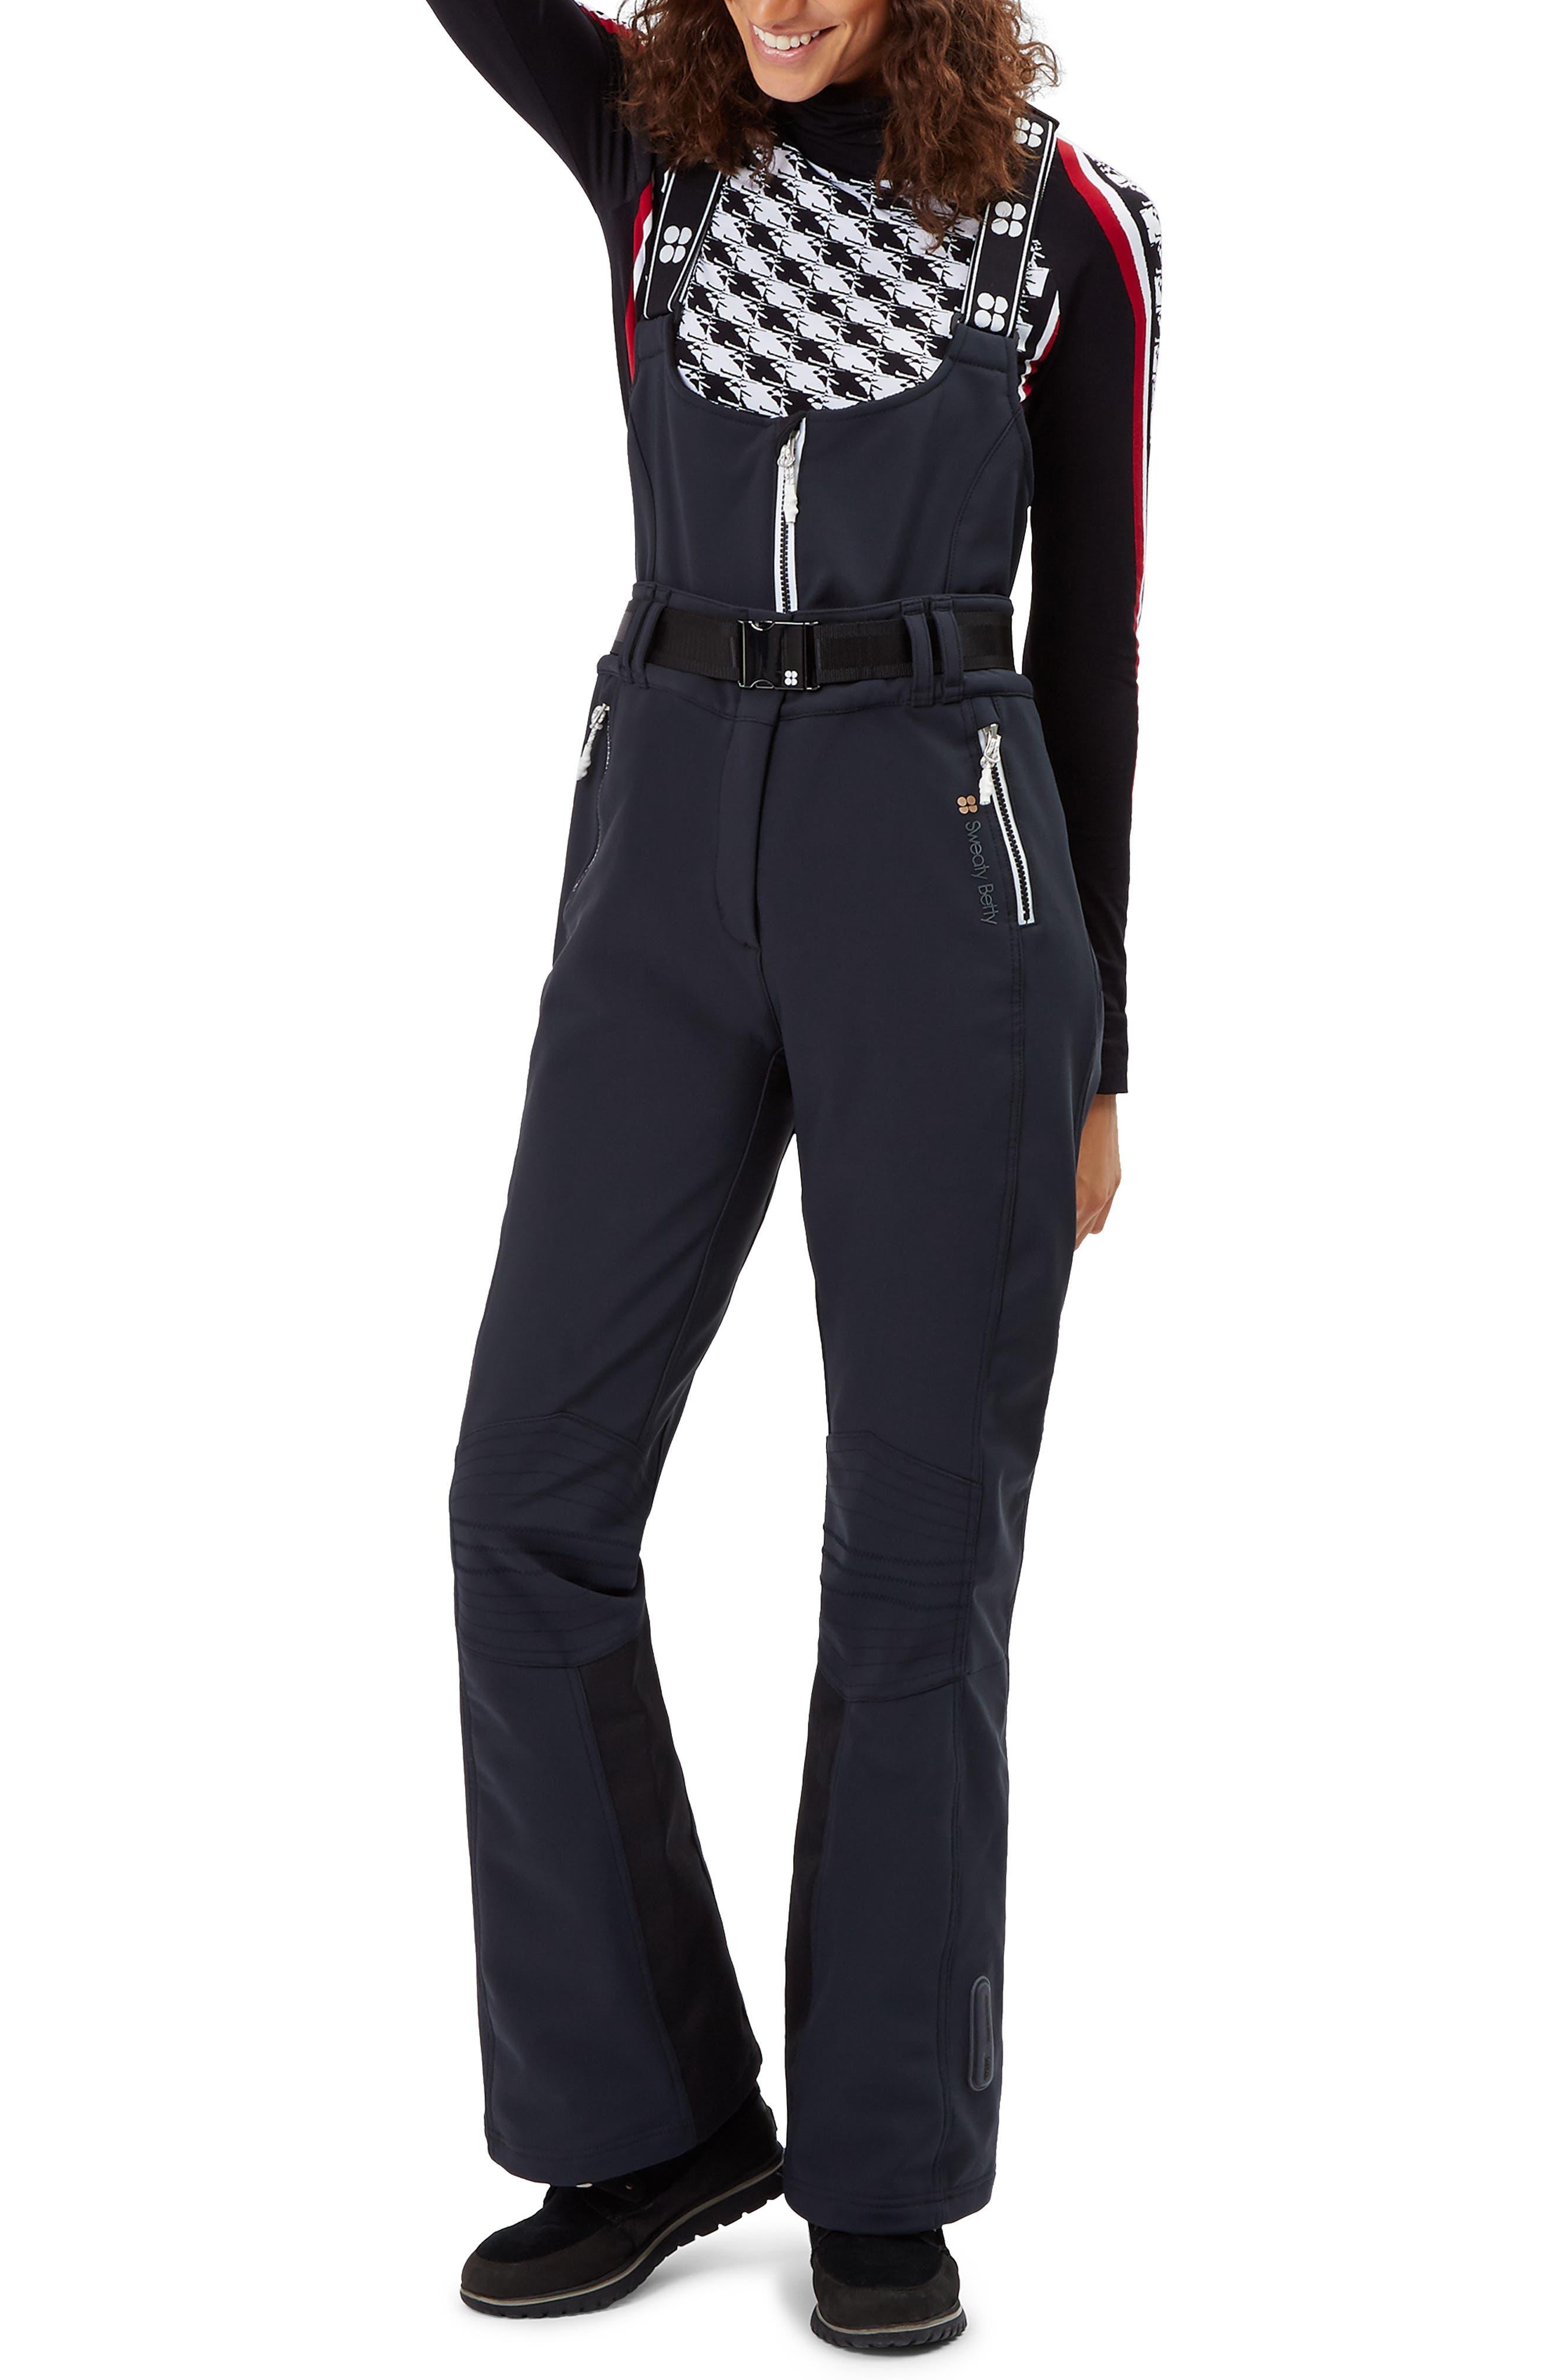 Astro Waterproof Soft Shell Ski Pants,                             Main thumbnail 1, color,                             BLACK